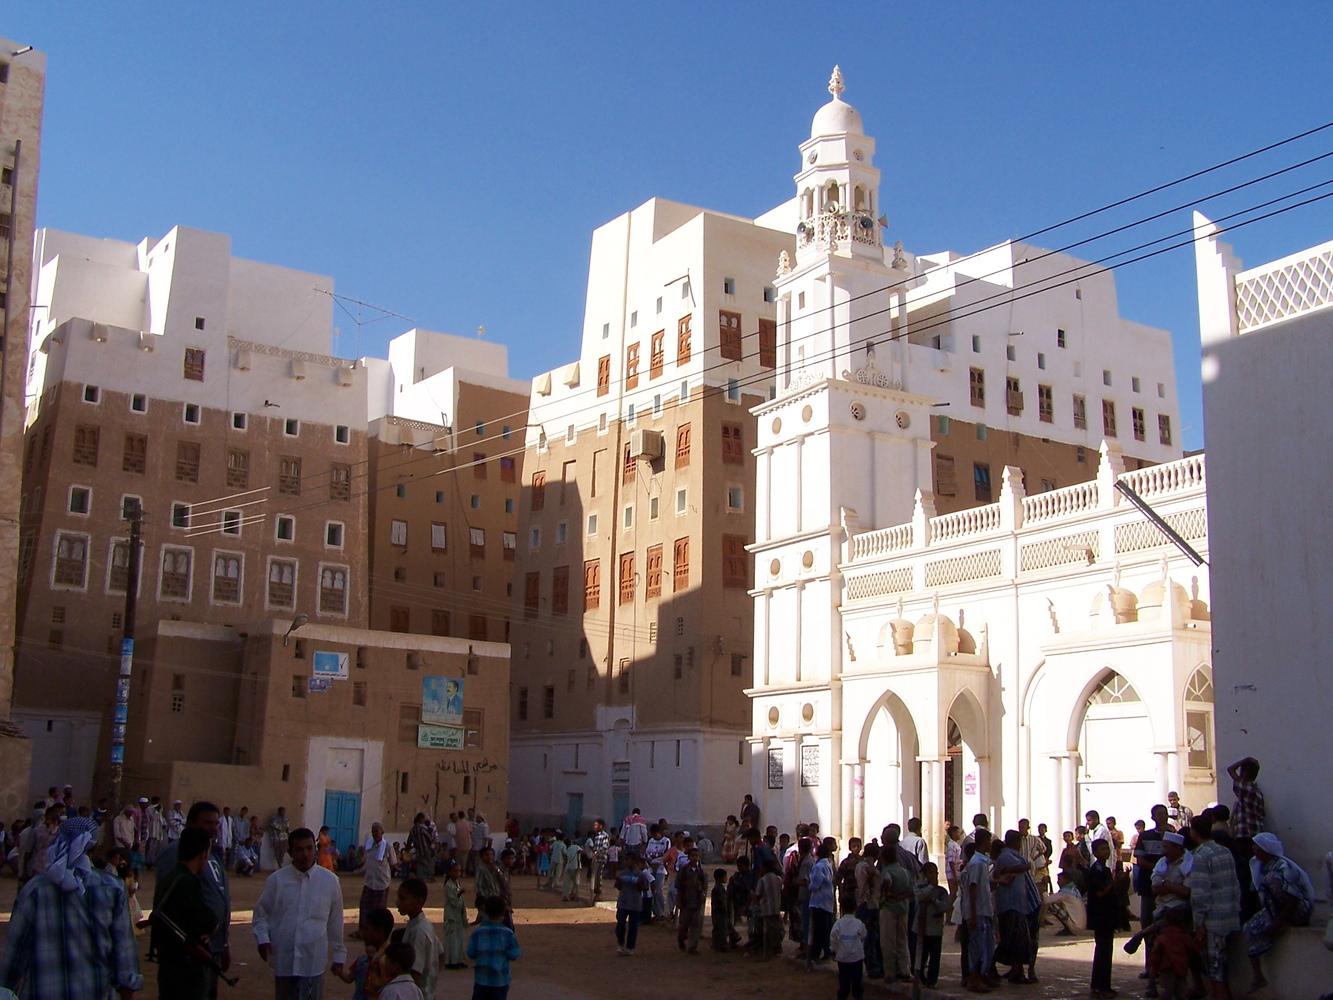 The 'Manhattan of the Desert': Shibam, Yemen's Ancient Skyscraper City,Haroon Alrashid Mosque in Shibam. Image © Flickr CC user Najeeb Musallam